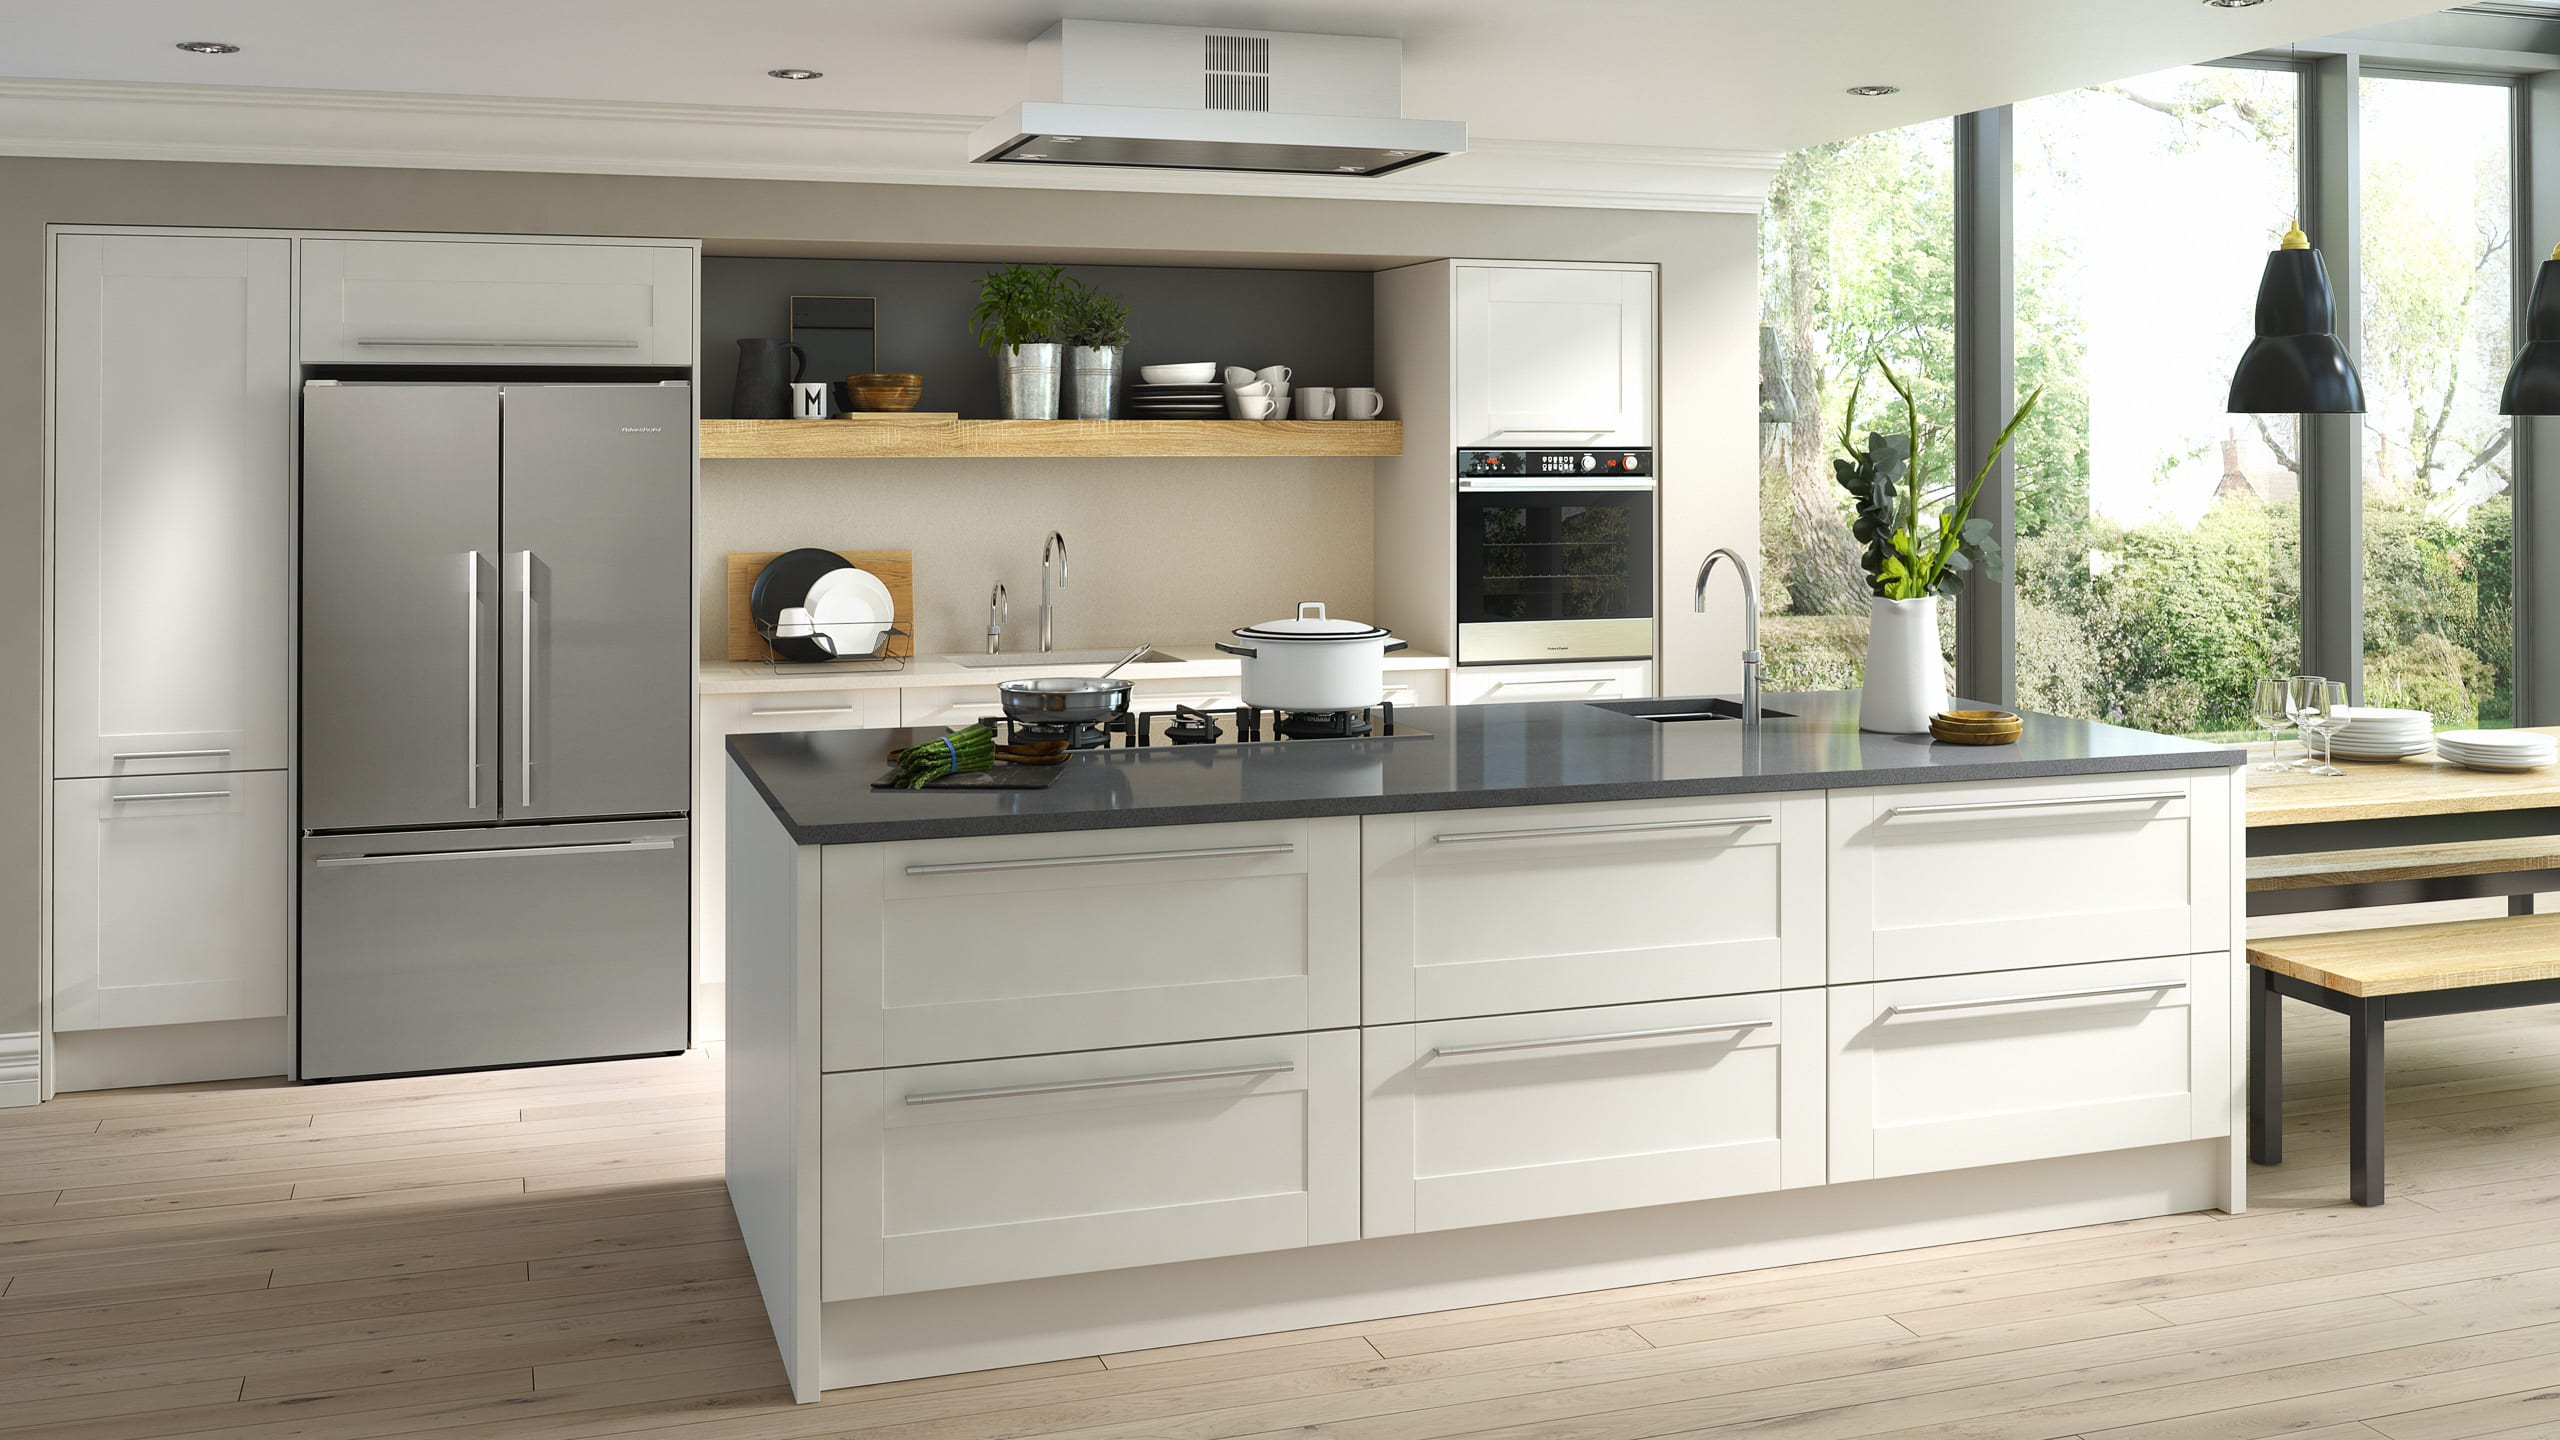 Broadstyle Ivory - kitchen